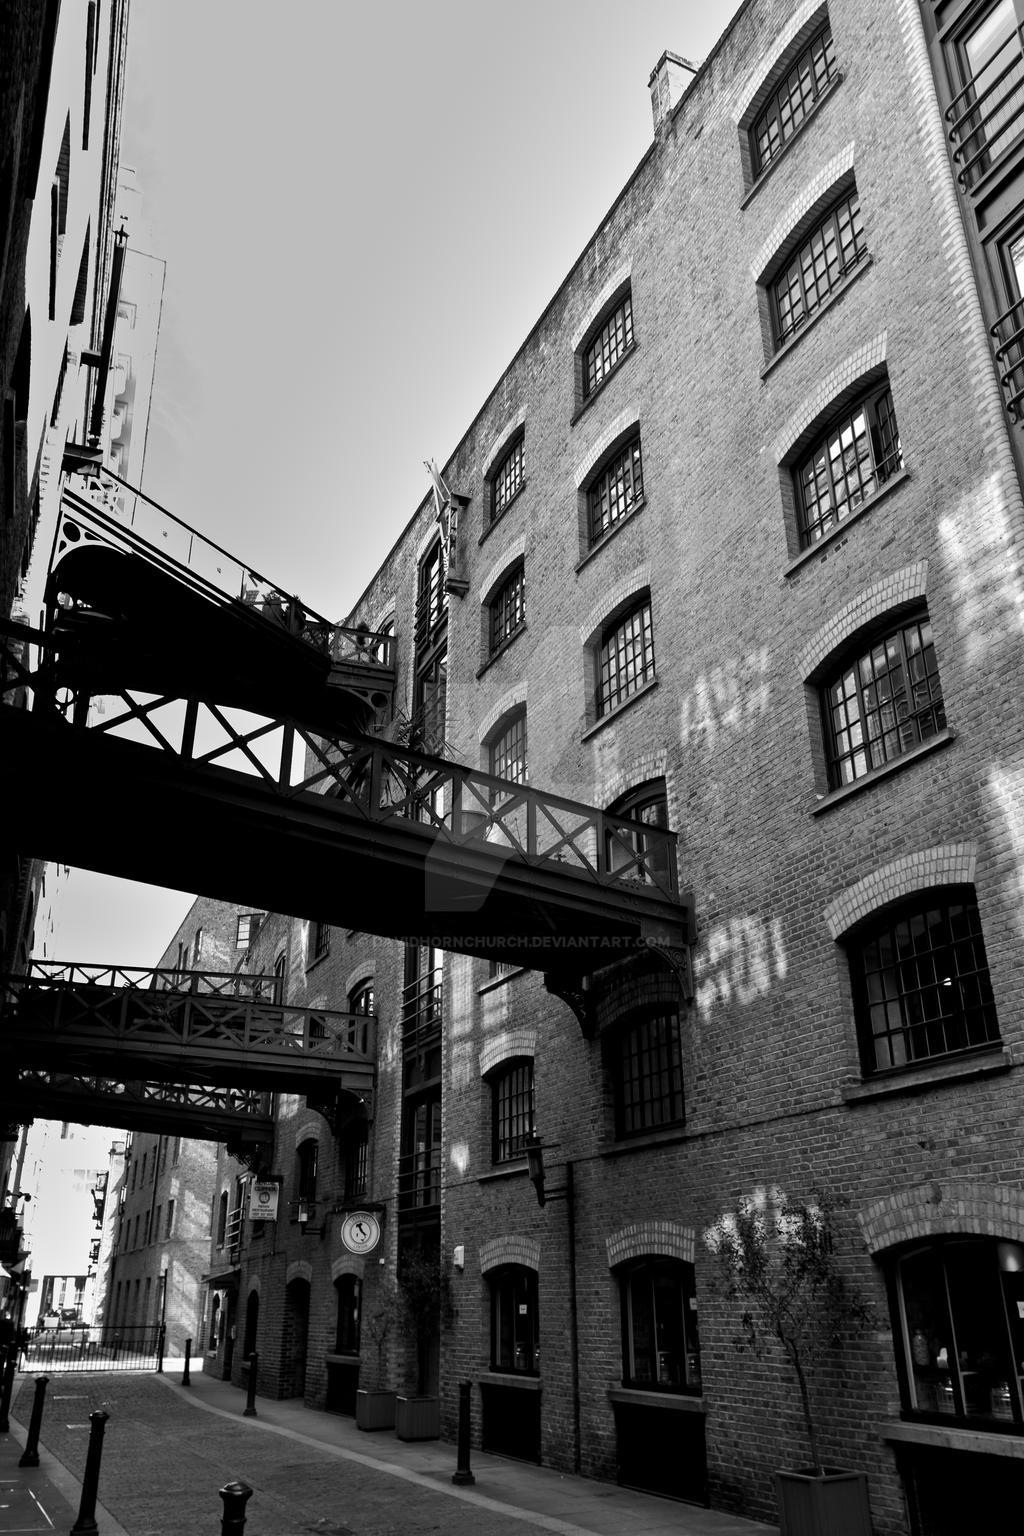 Butlers Wharf Chop House - instagram.com